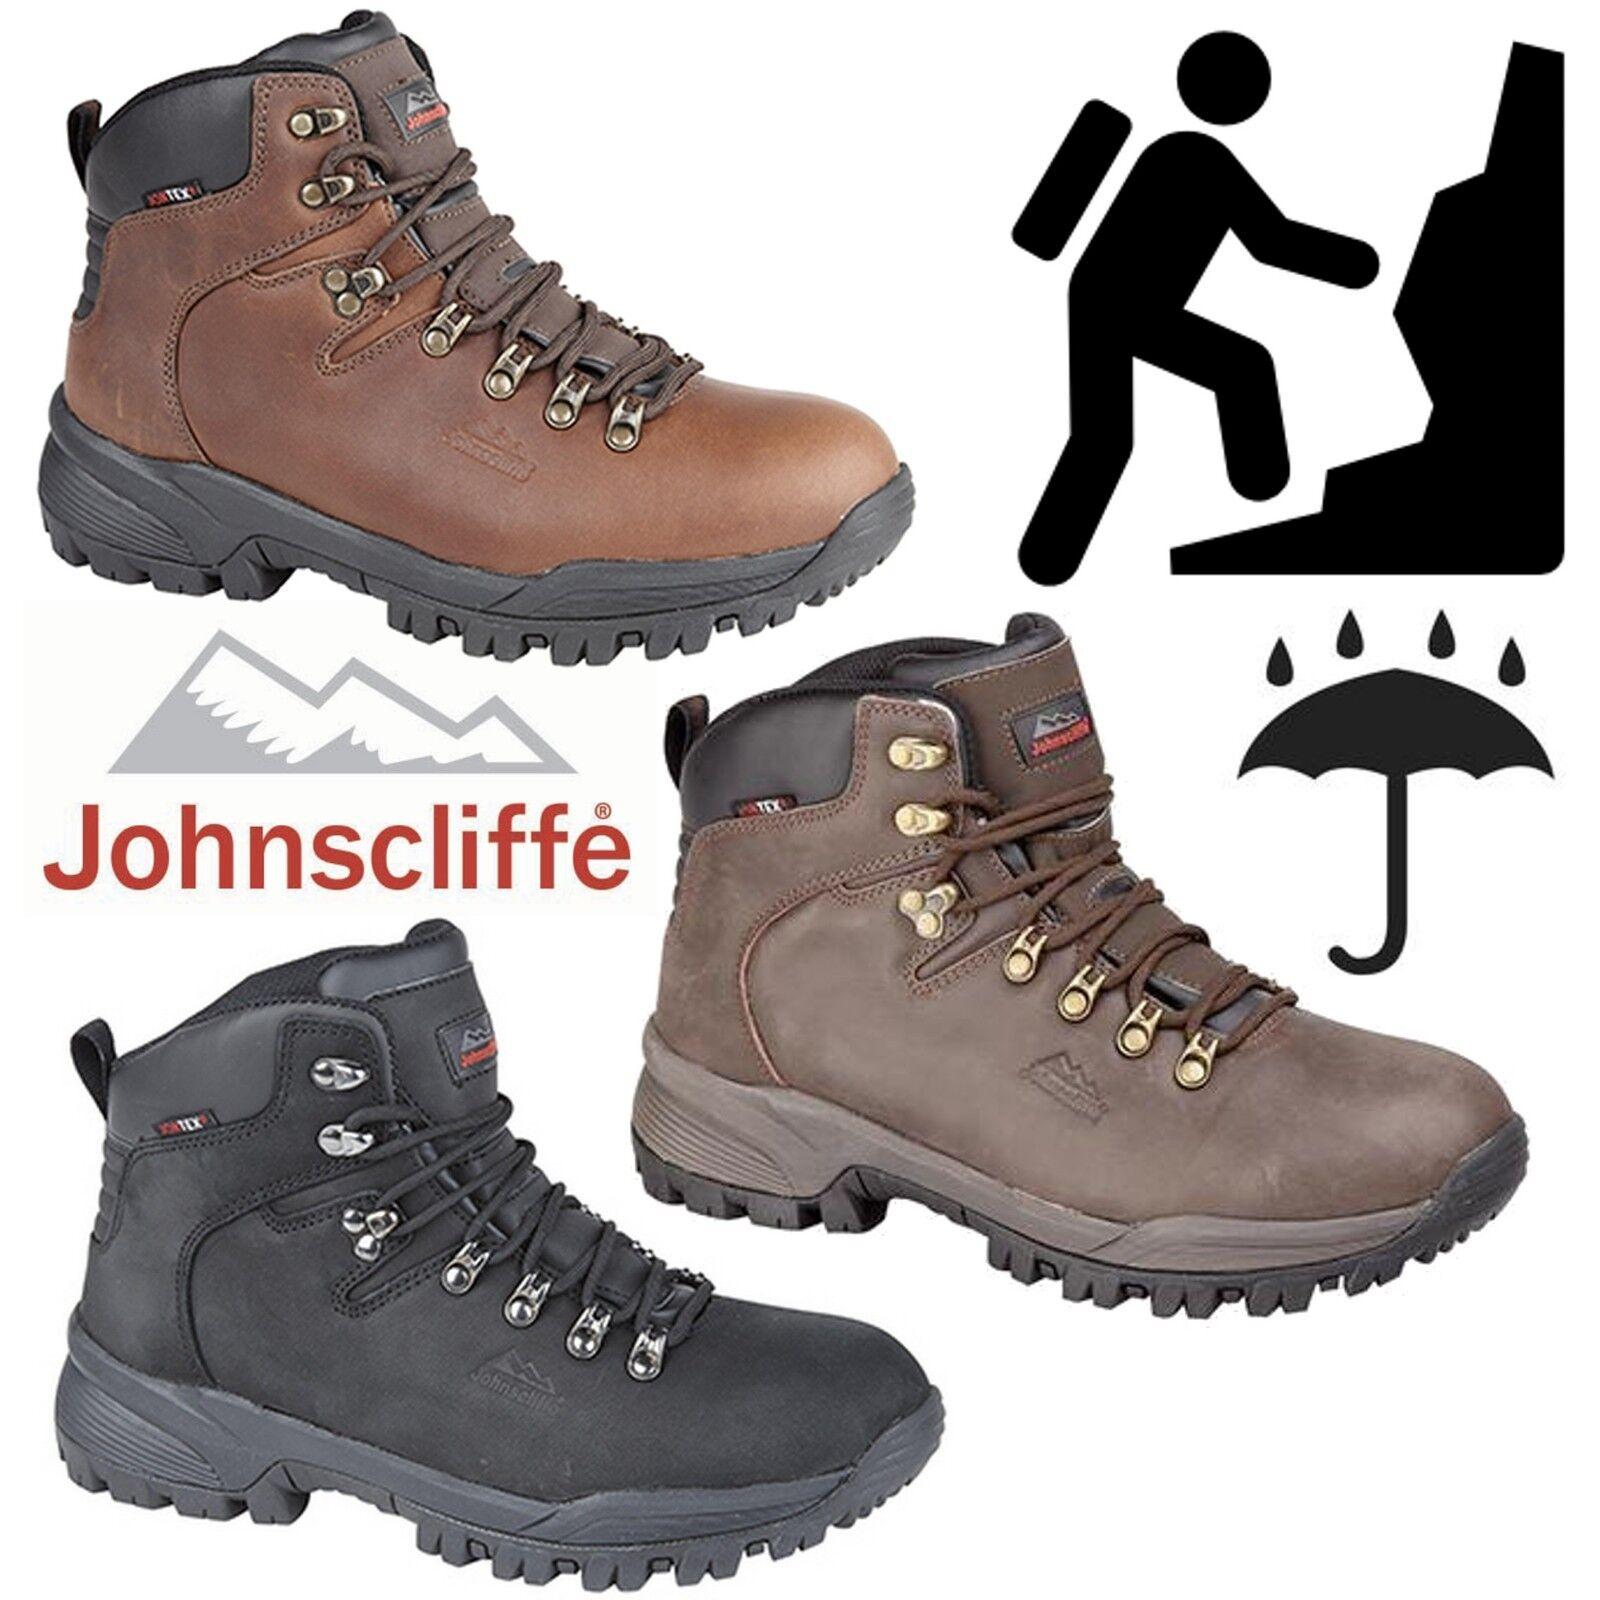 johnscliffe mens walking boots